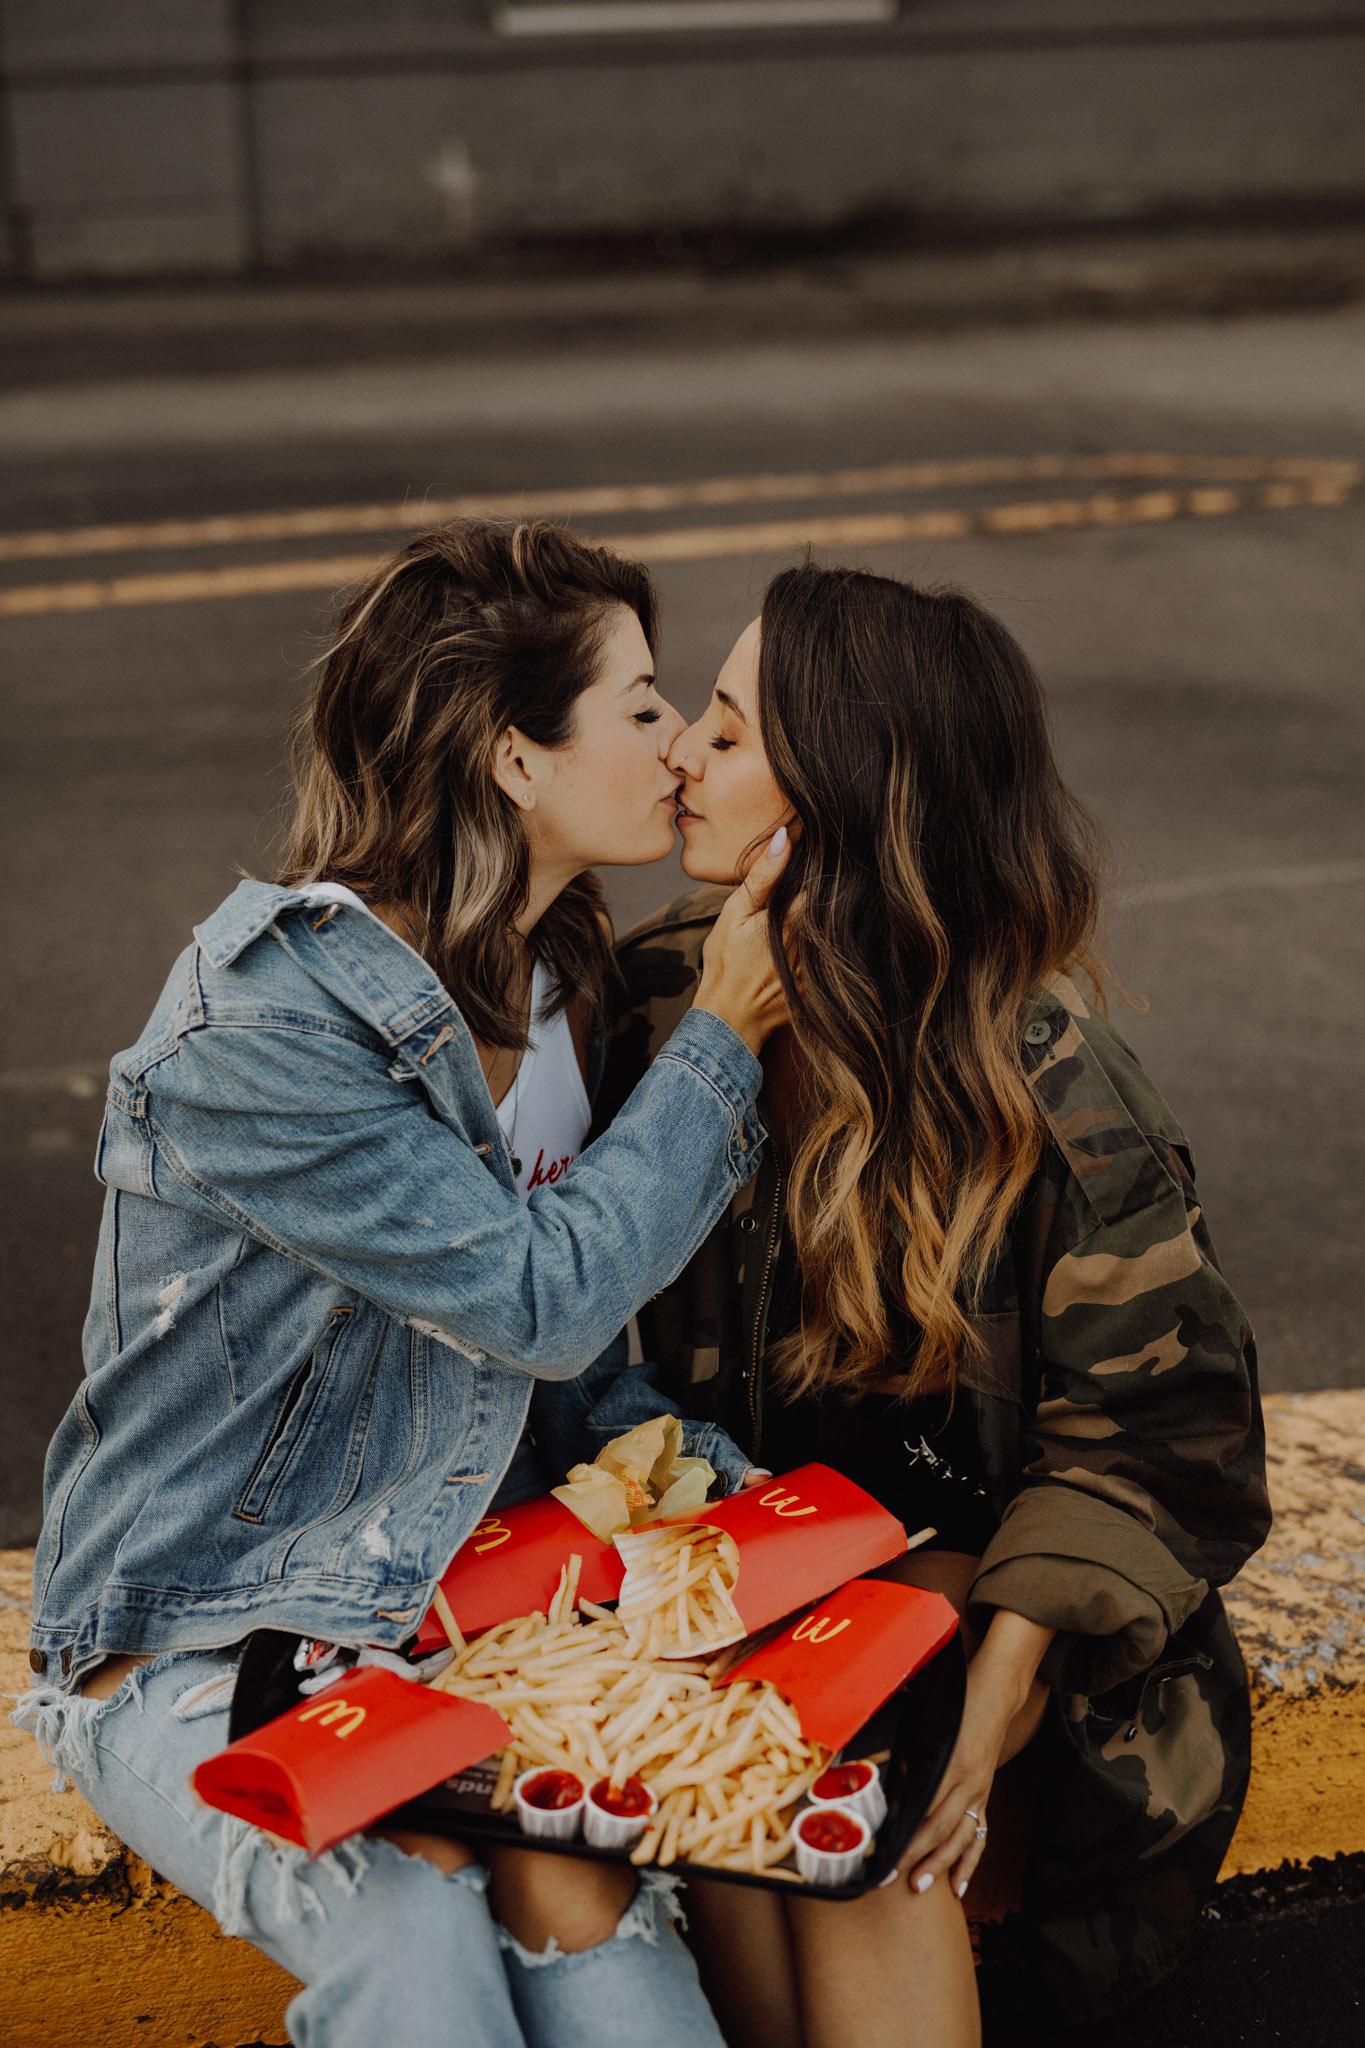 Mcdonalds engagement session - kissing